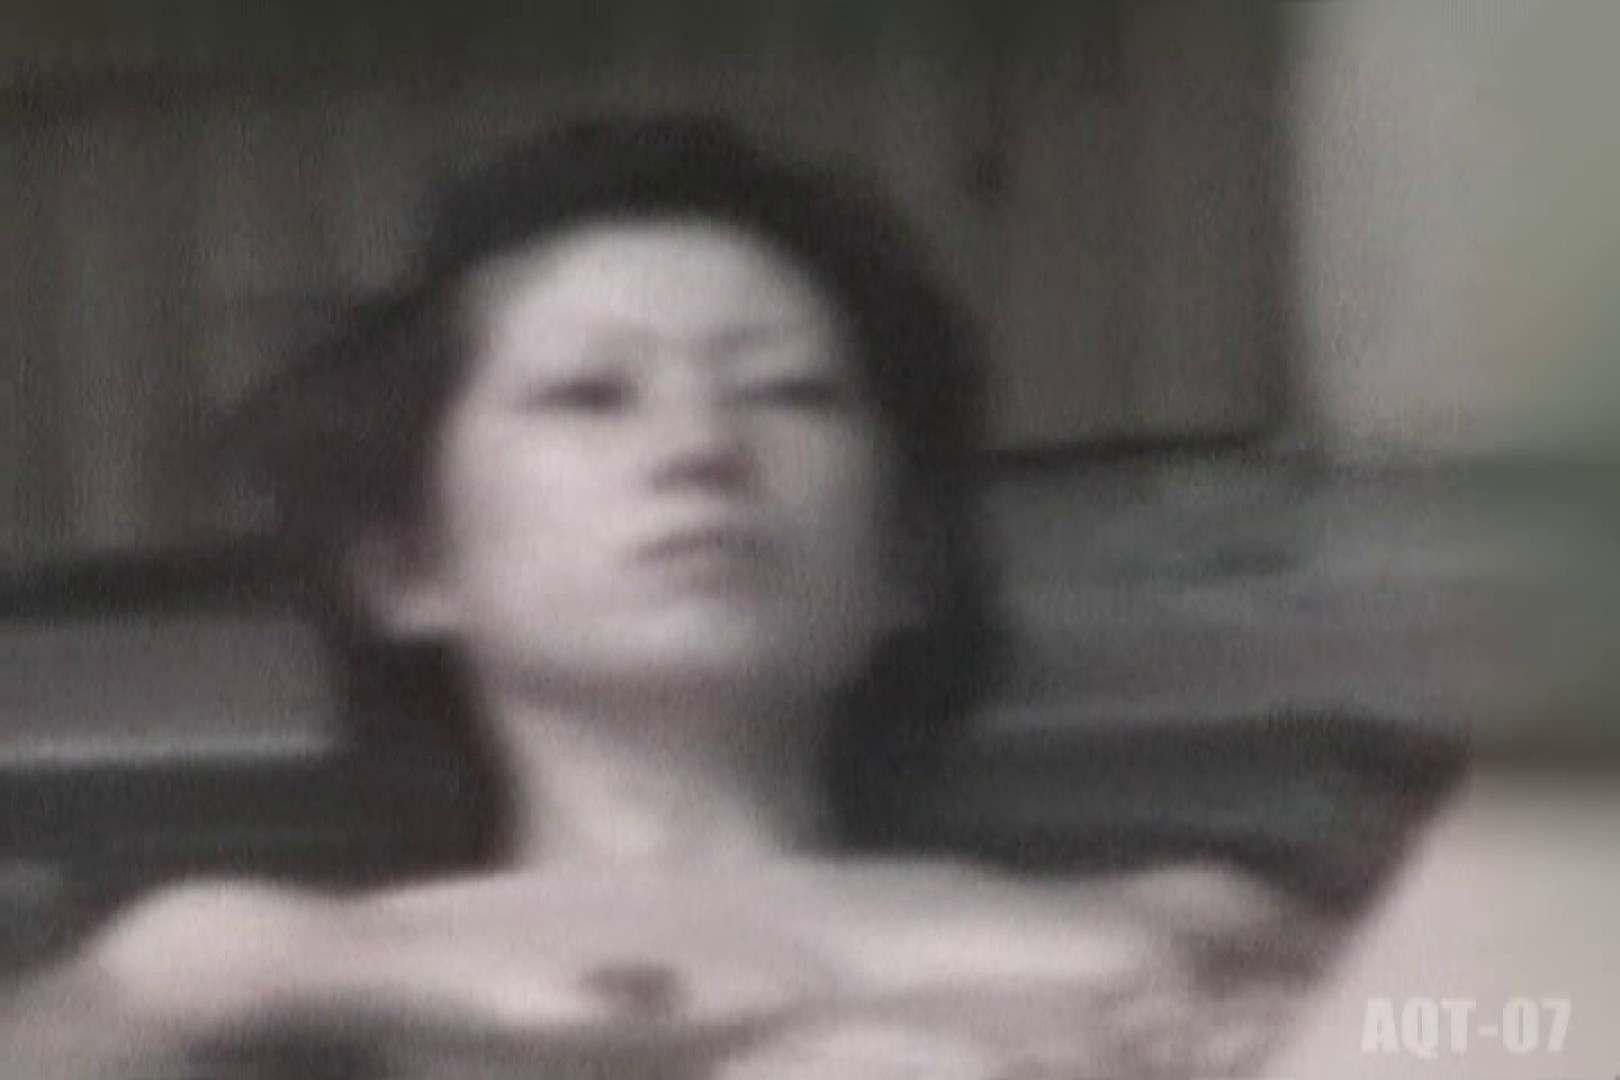 Aquaな露天風呂Vol.766 盗撮特撮  12pic 3